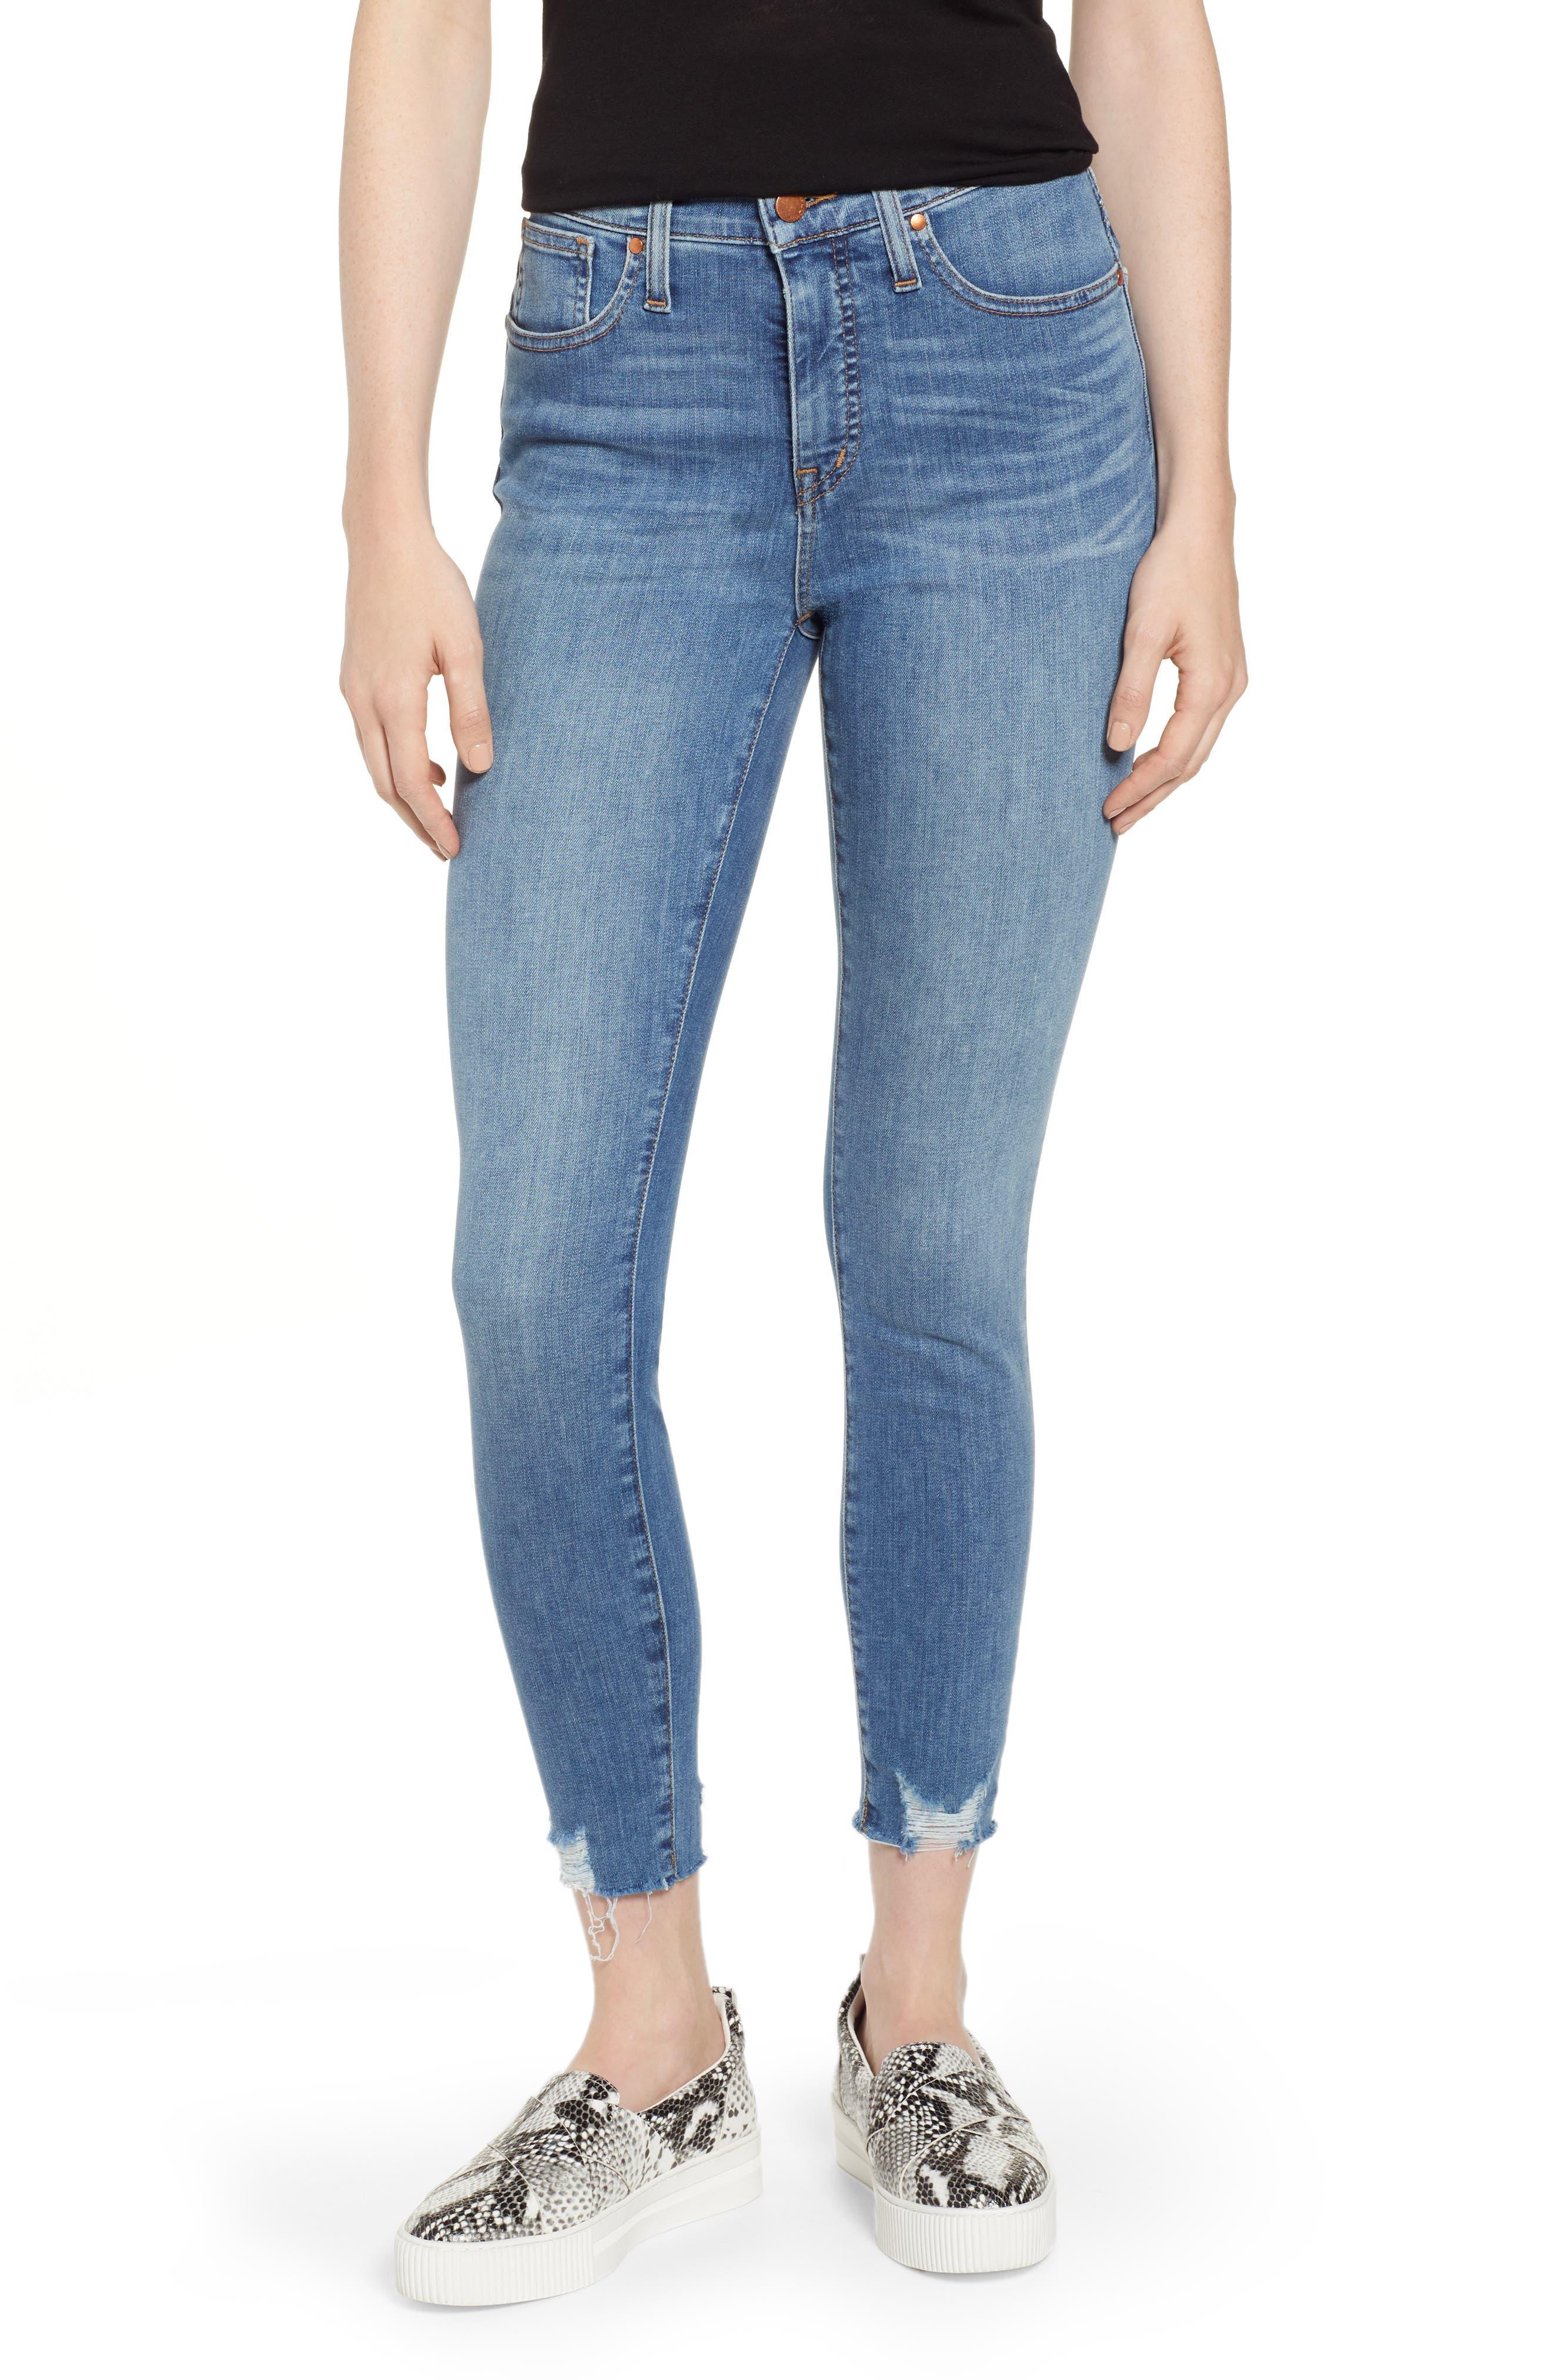 Sierra High Waist Raw Hem Skinny Jeans,                             Main thumbnail 1, color,                             NORIKO